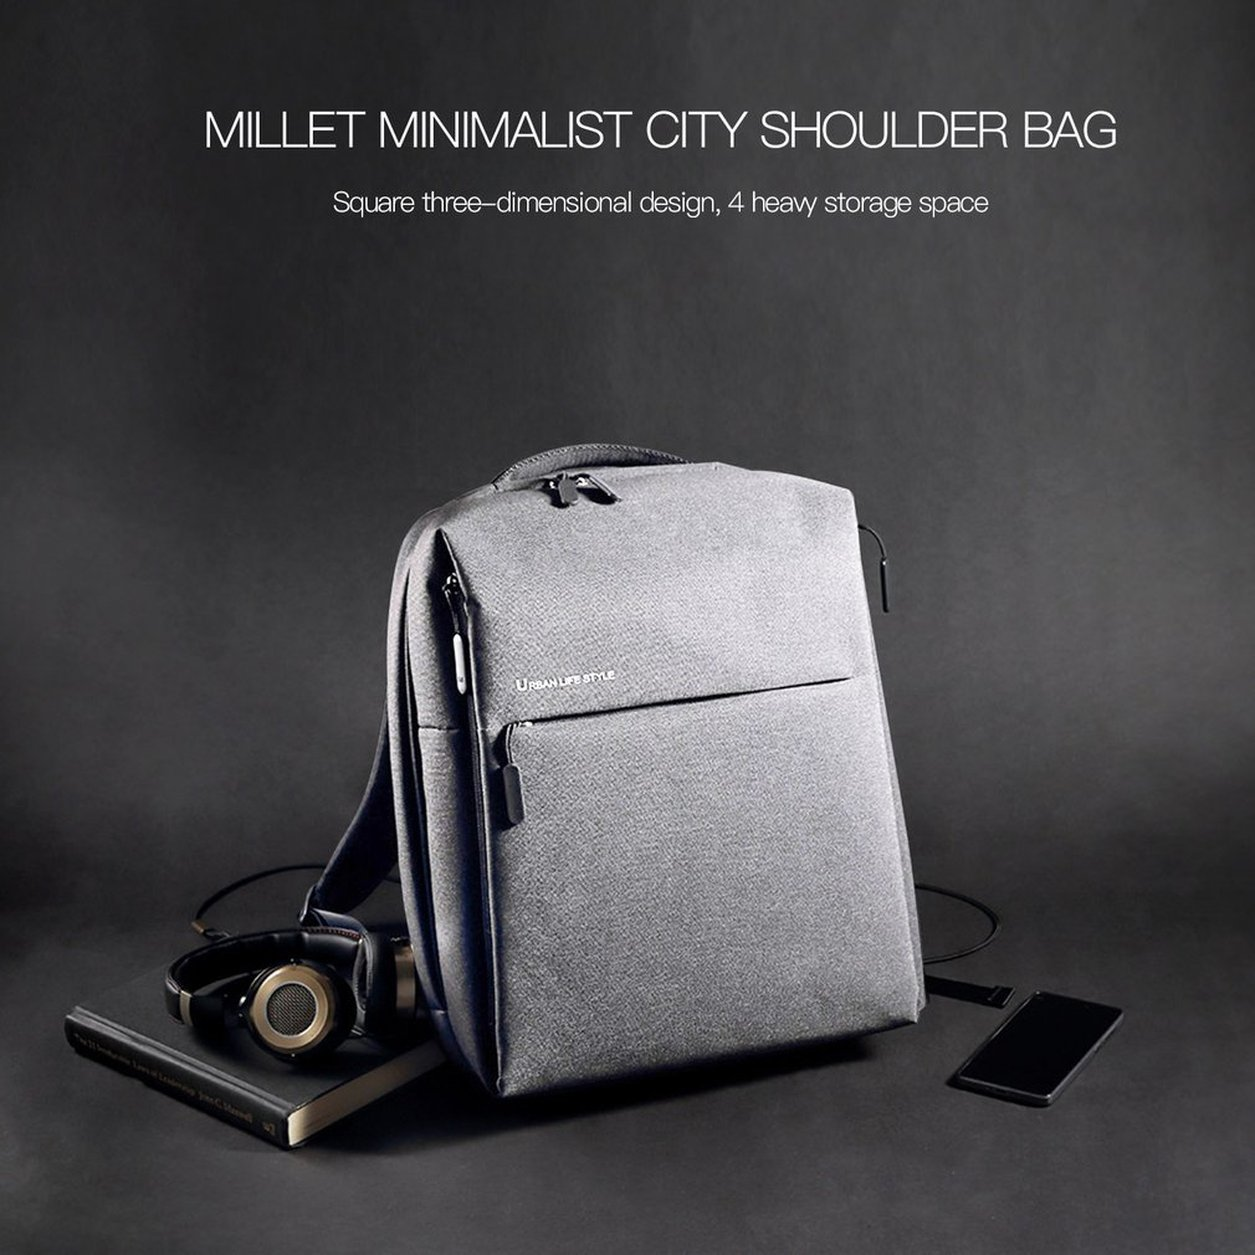 Impermeable Minimalista Viaje Mochila Estilo de Vida Bolso Urbano Xiaomi Mi Bolso Vida de la Ciudad 4ee3cc